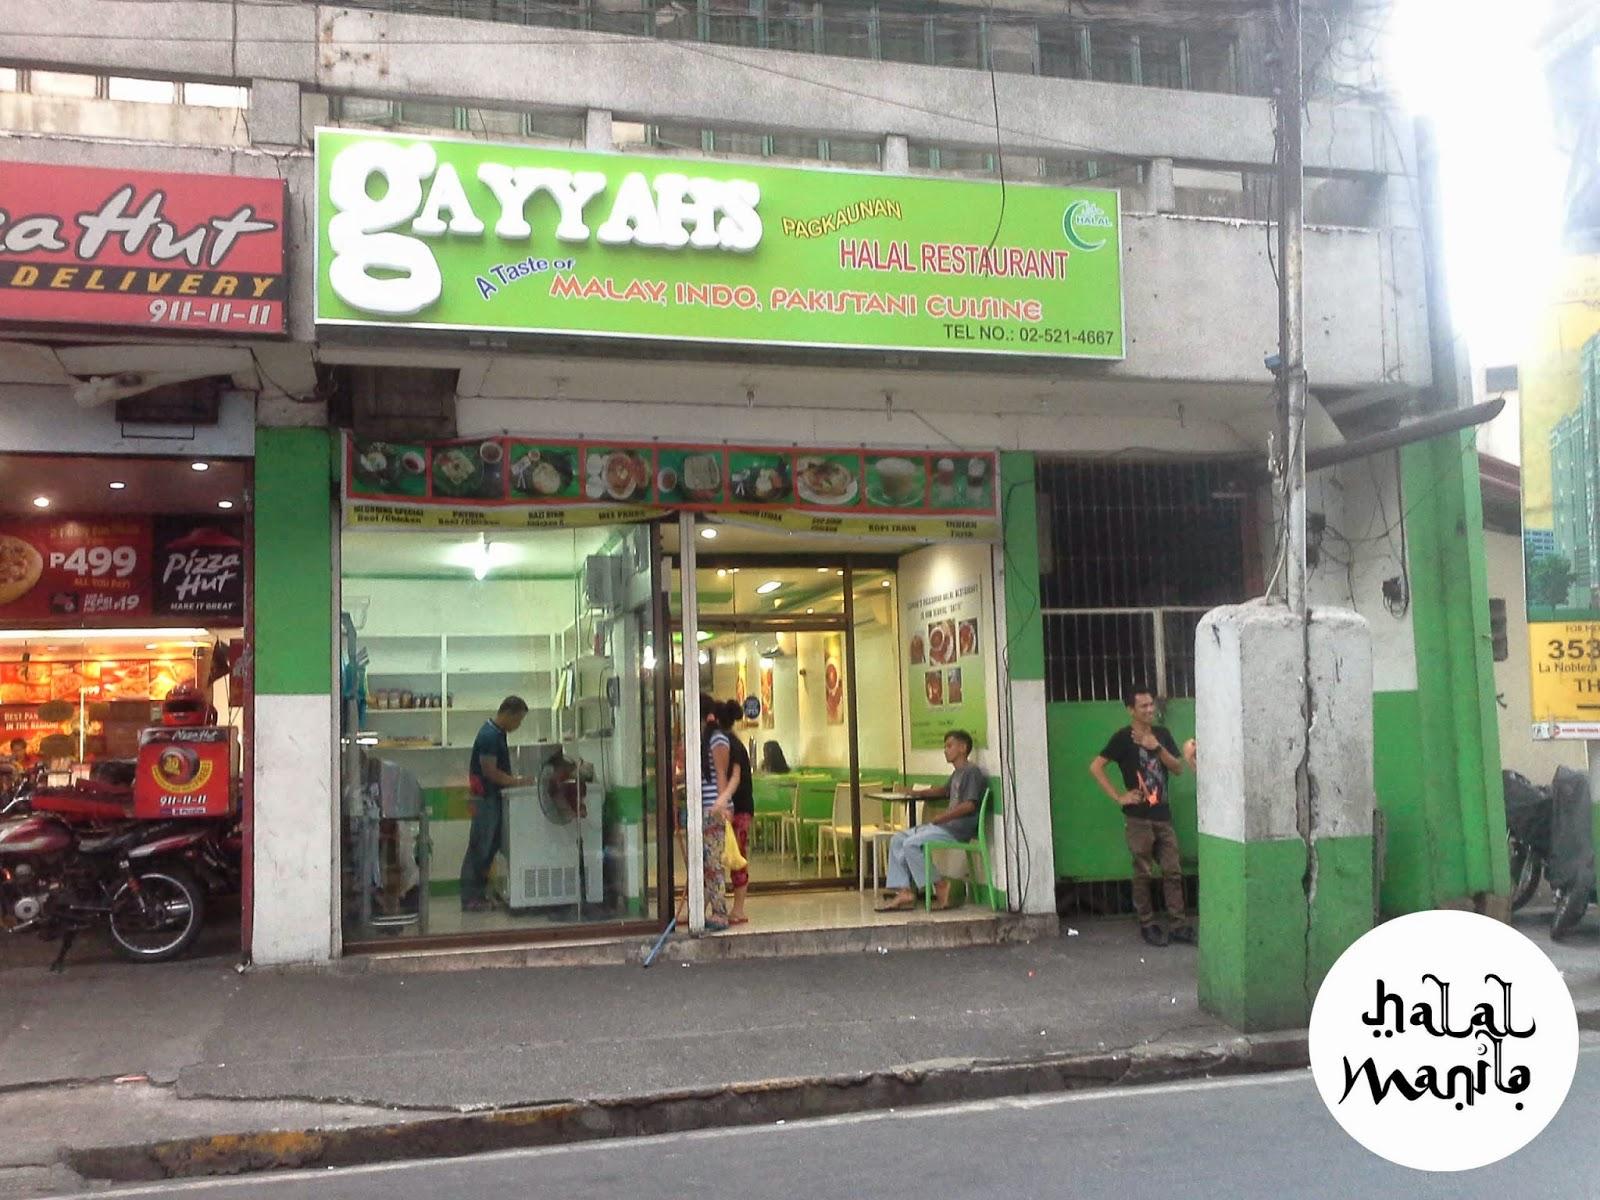 Gayyah Halal Food Manila Mabini